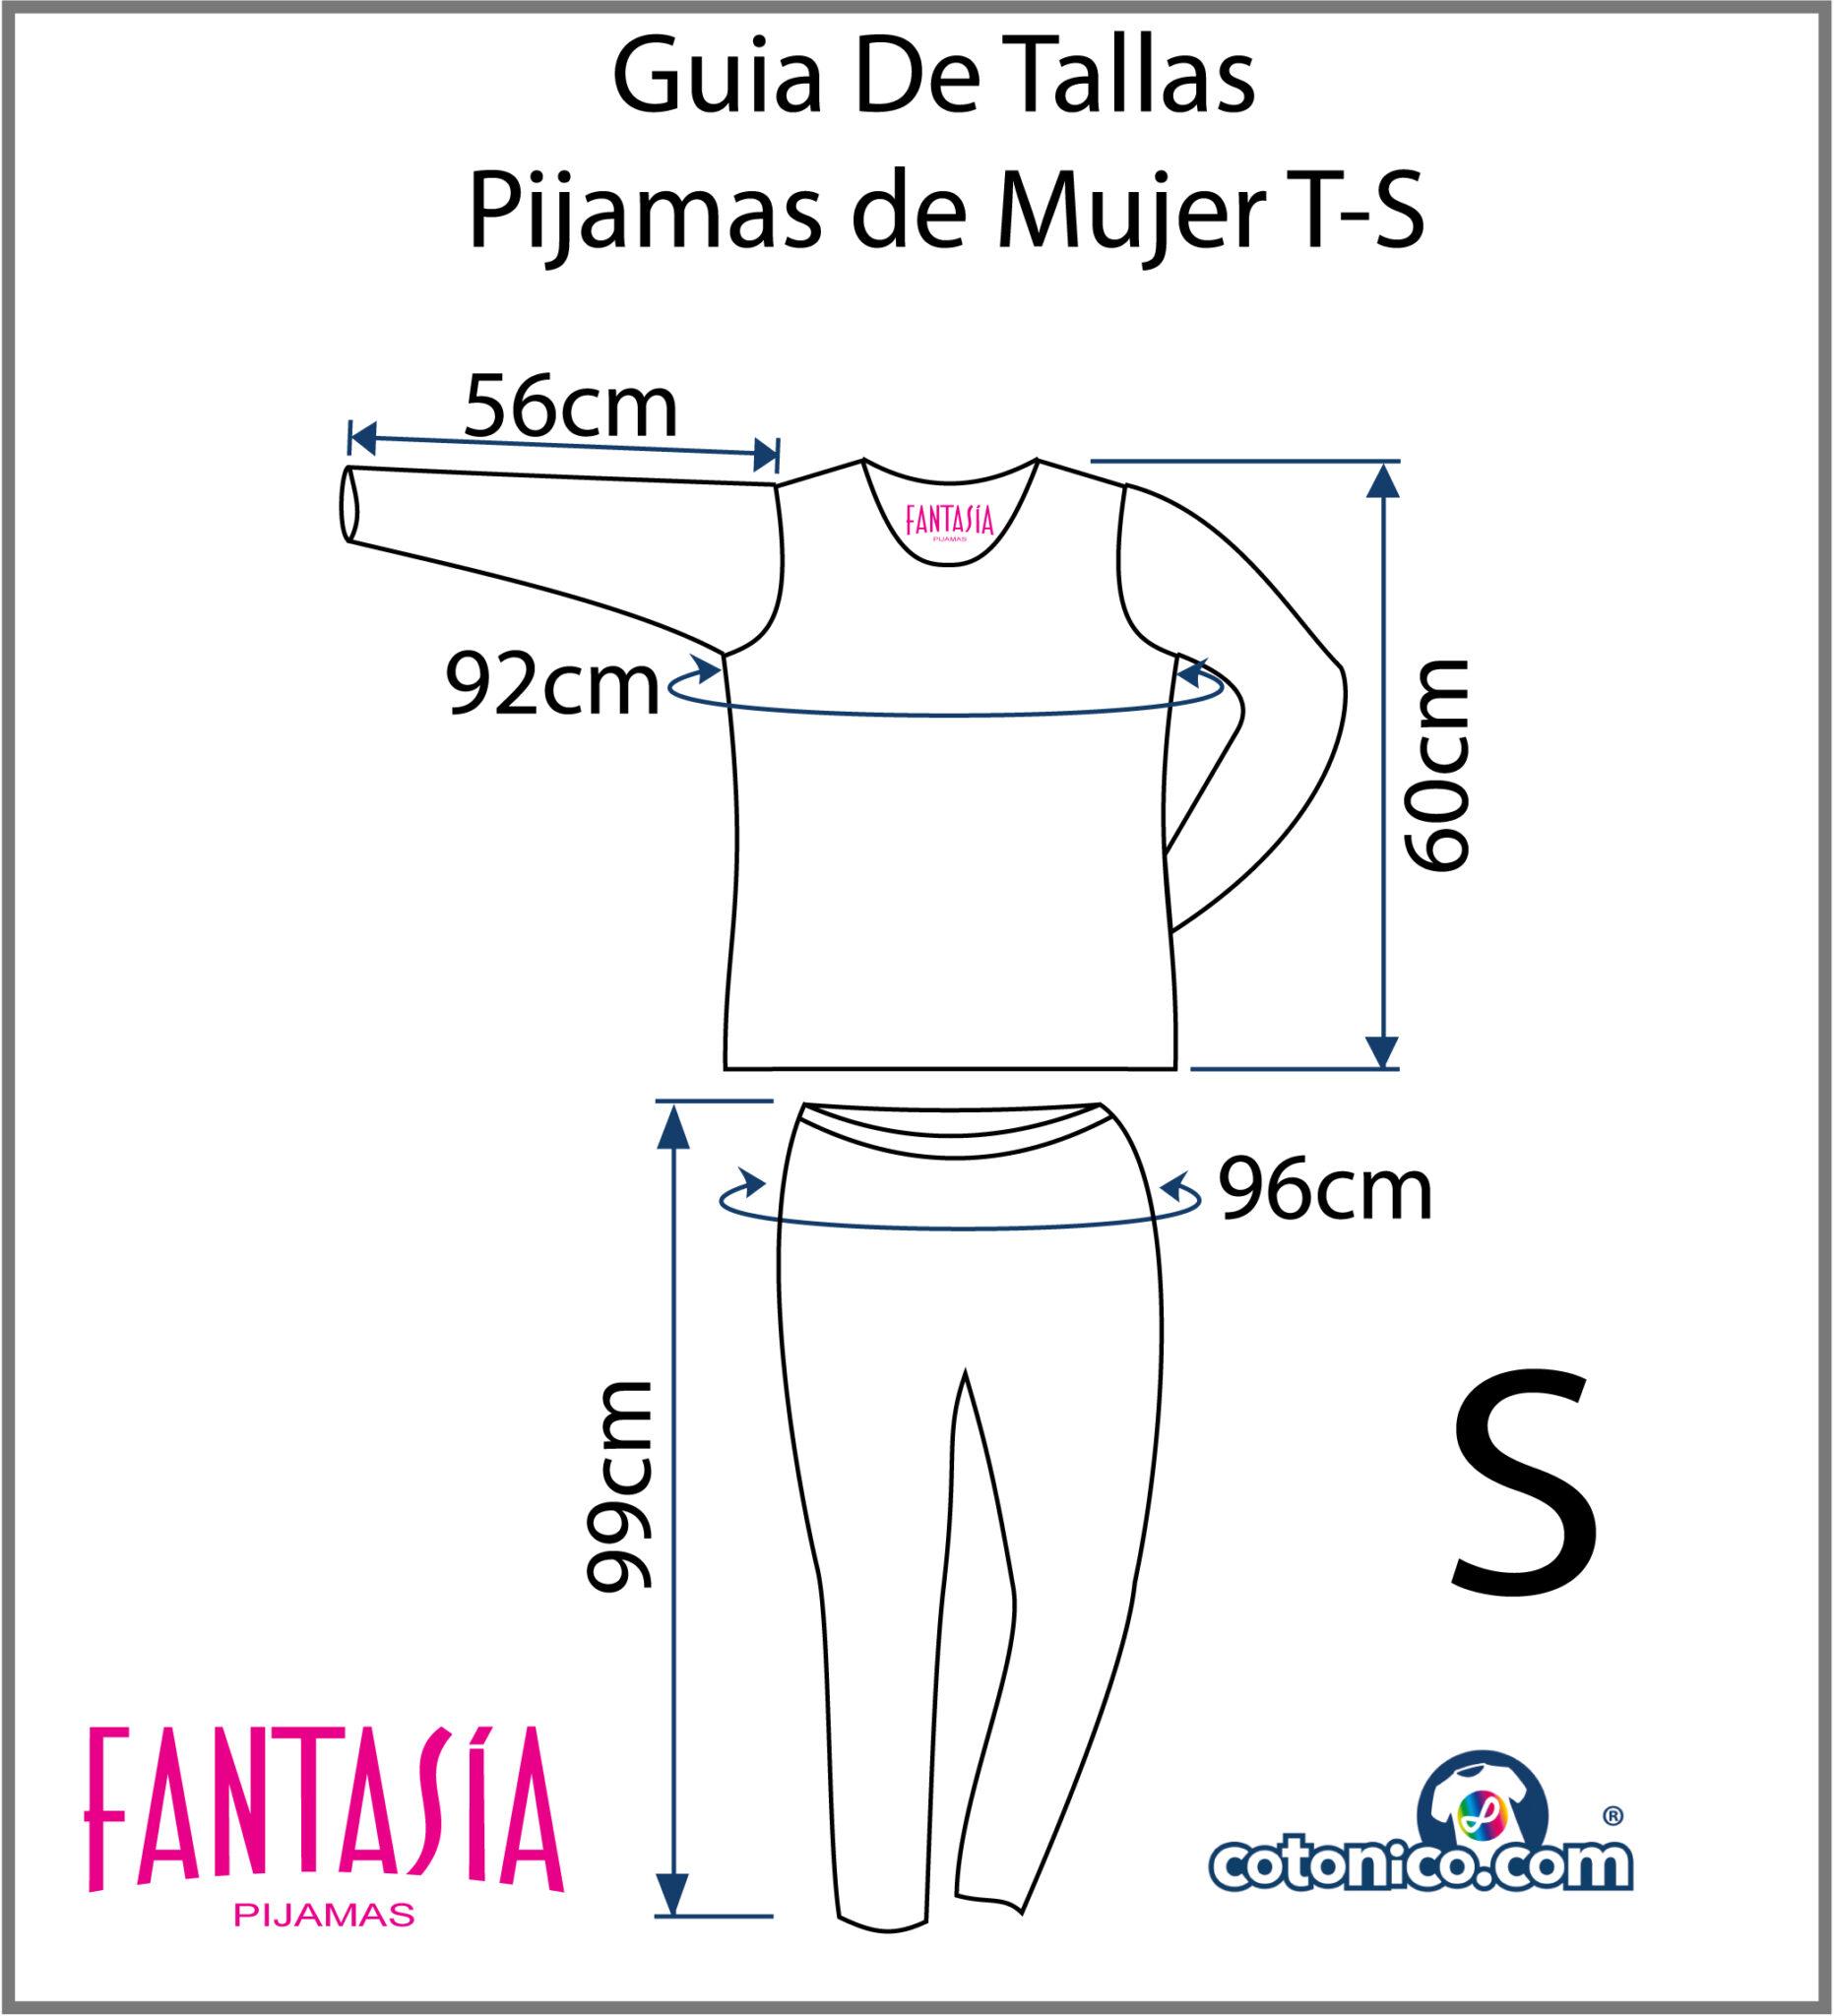 Guia-De-Tallas-Pijamas-De-Mujer-S